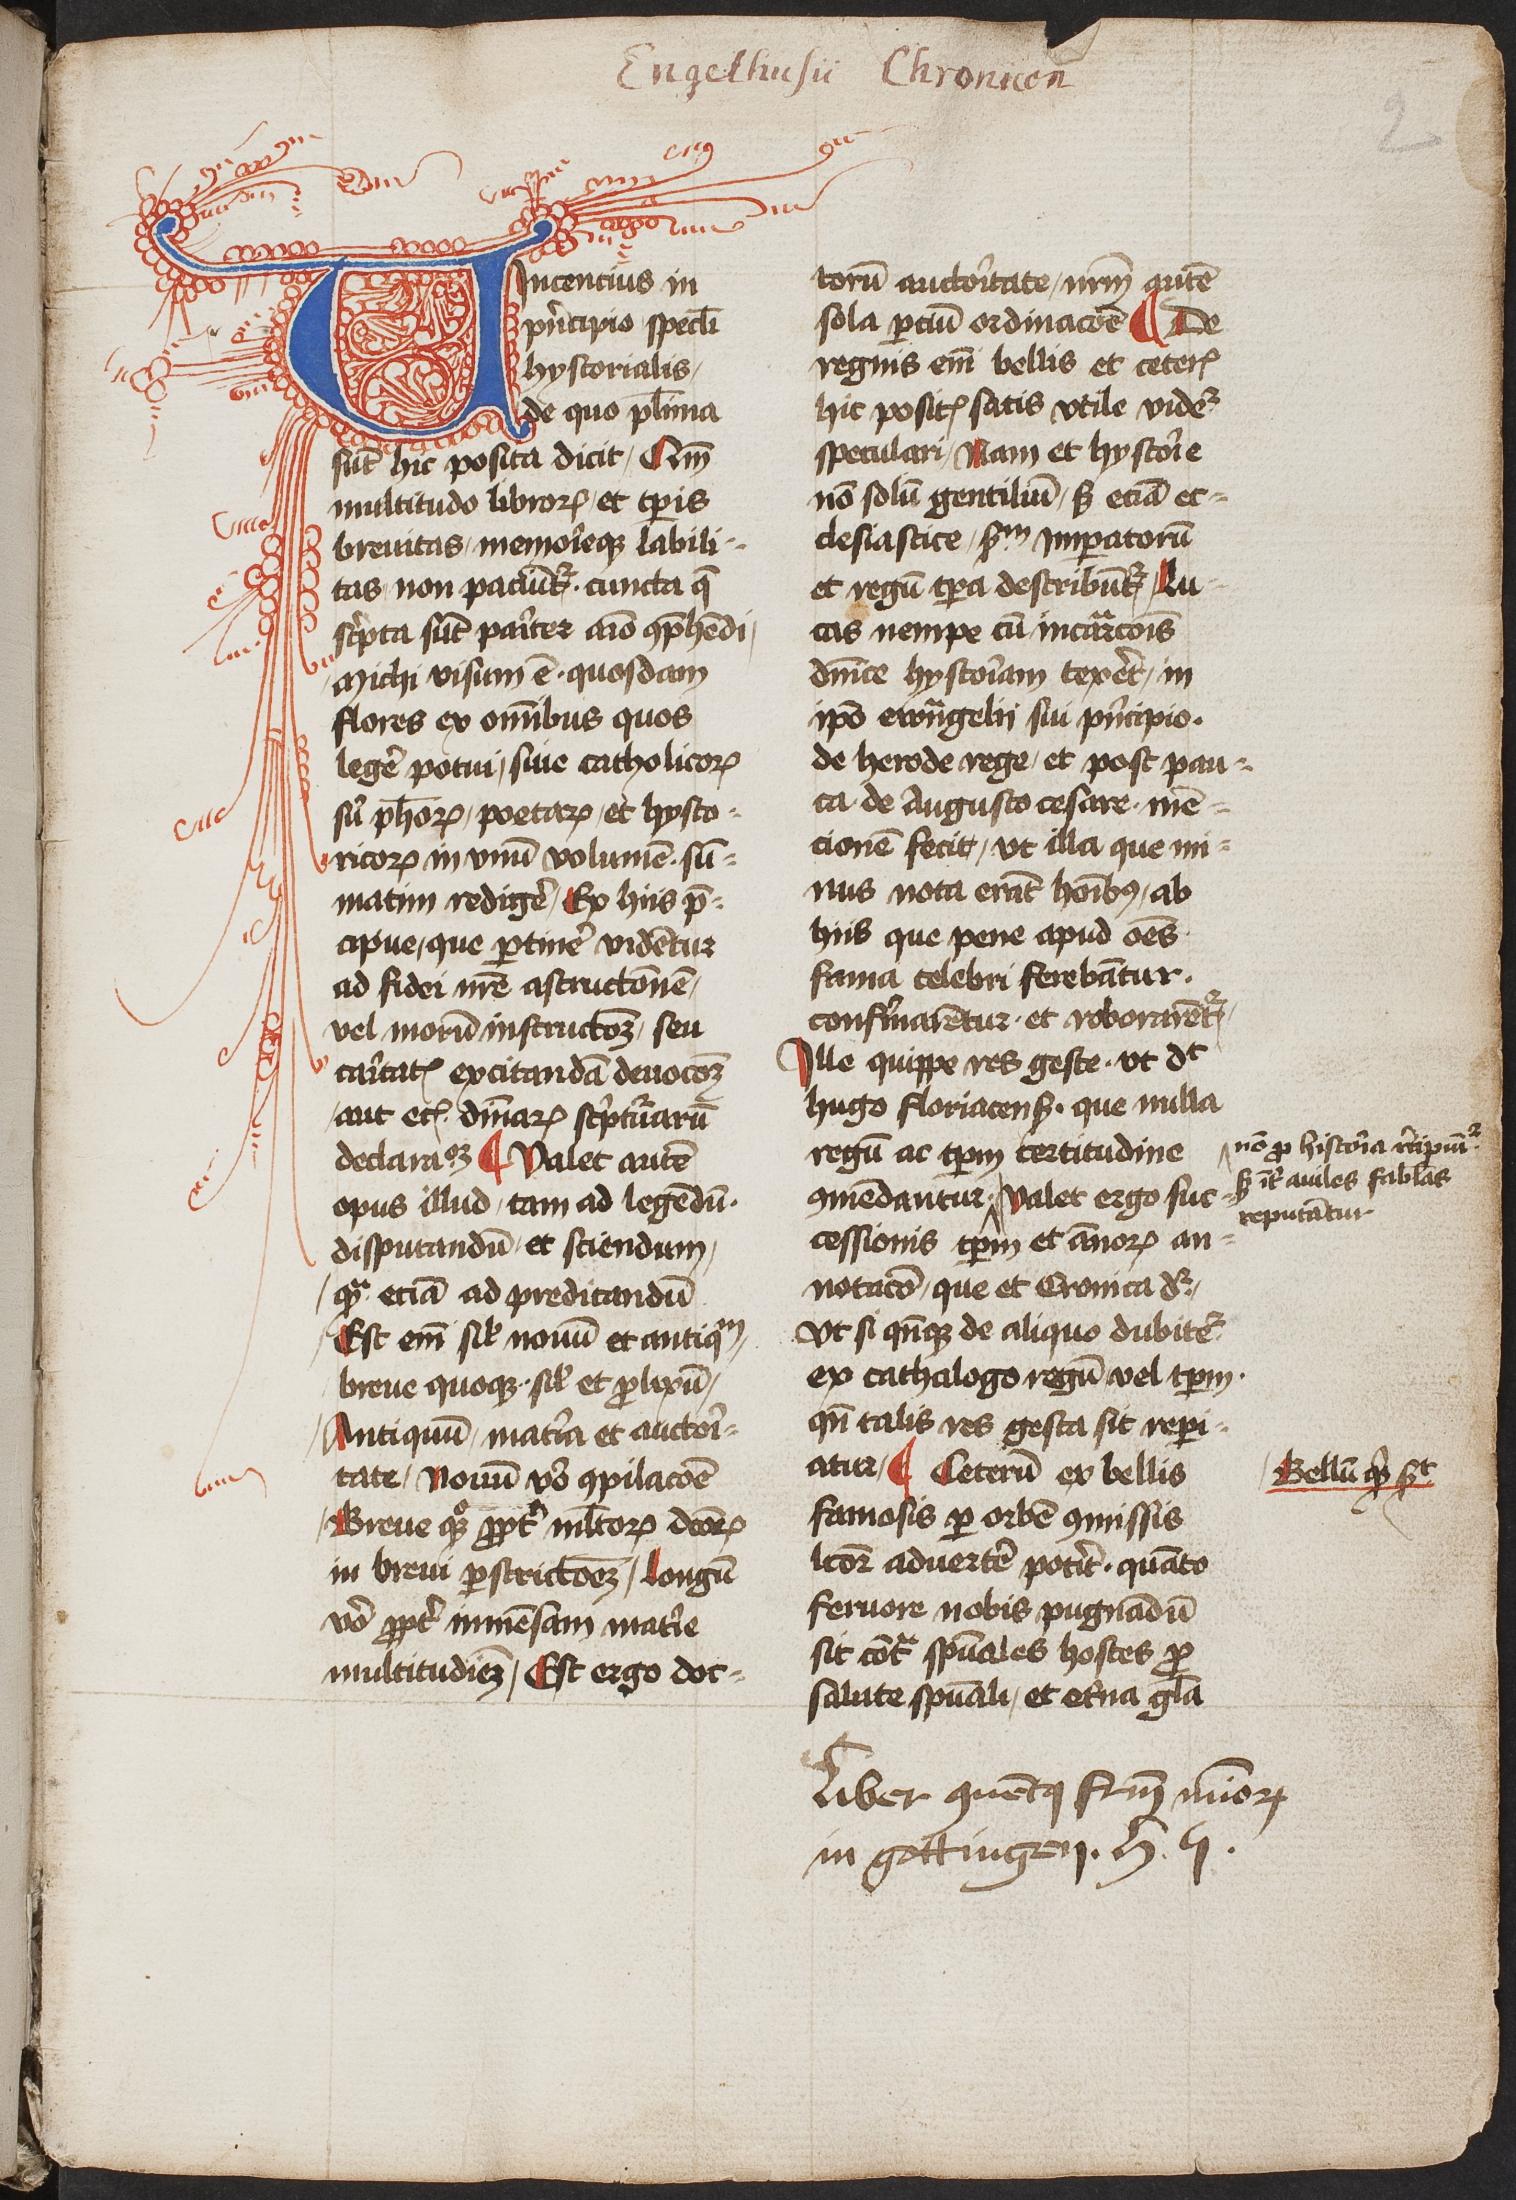 Handschrift: Ms. Mag. 147, fol. 2r